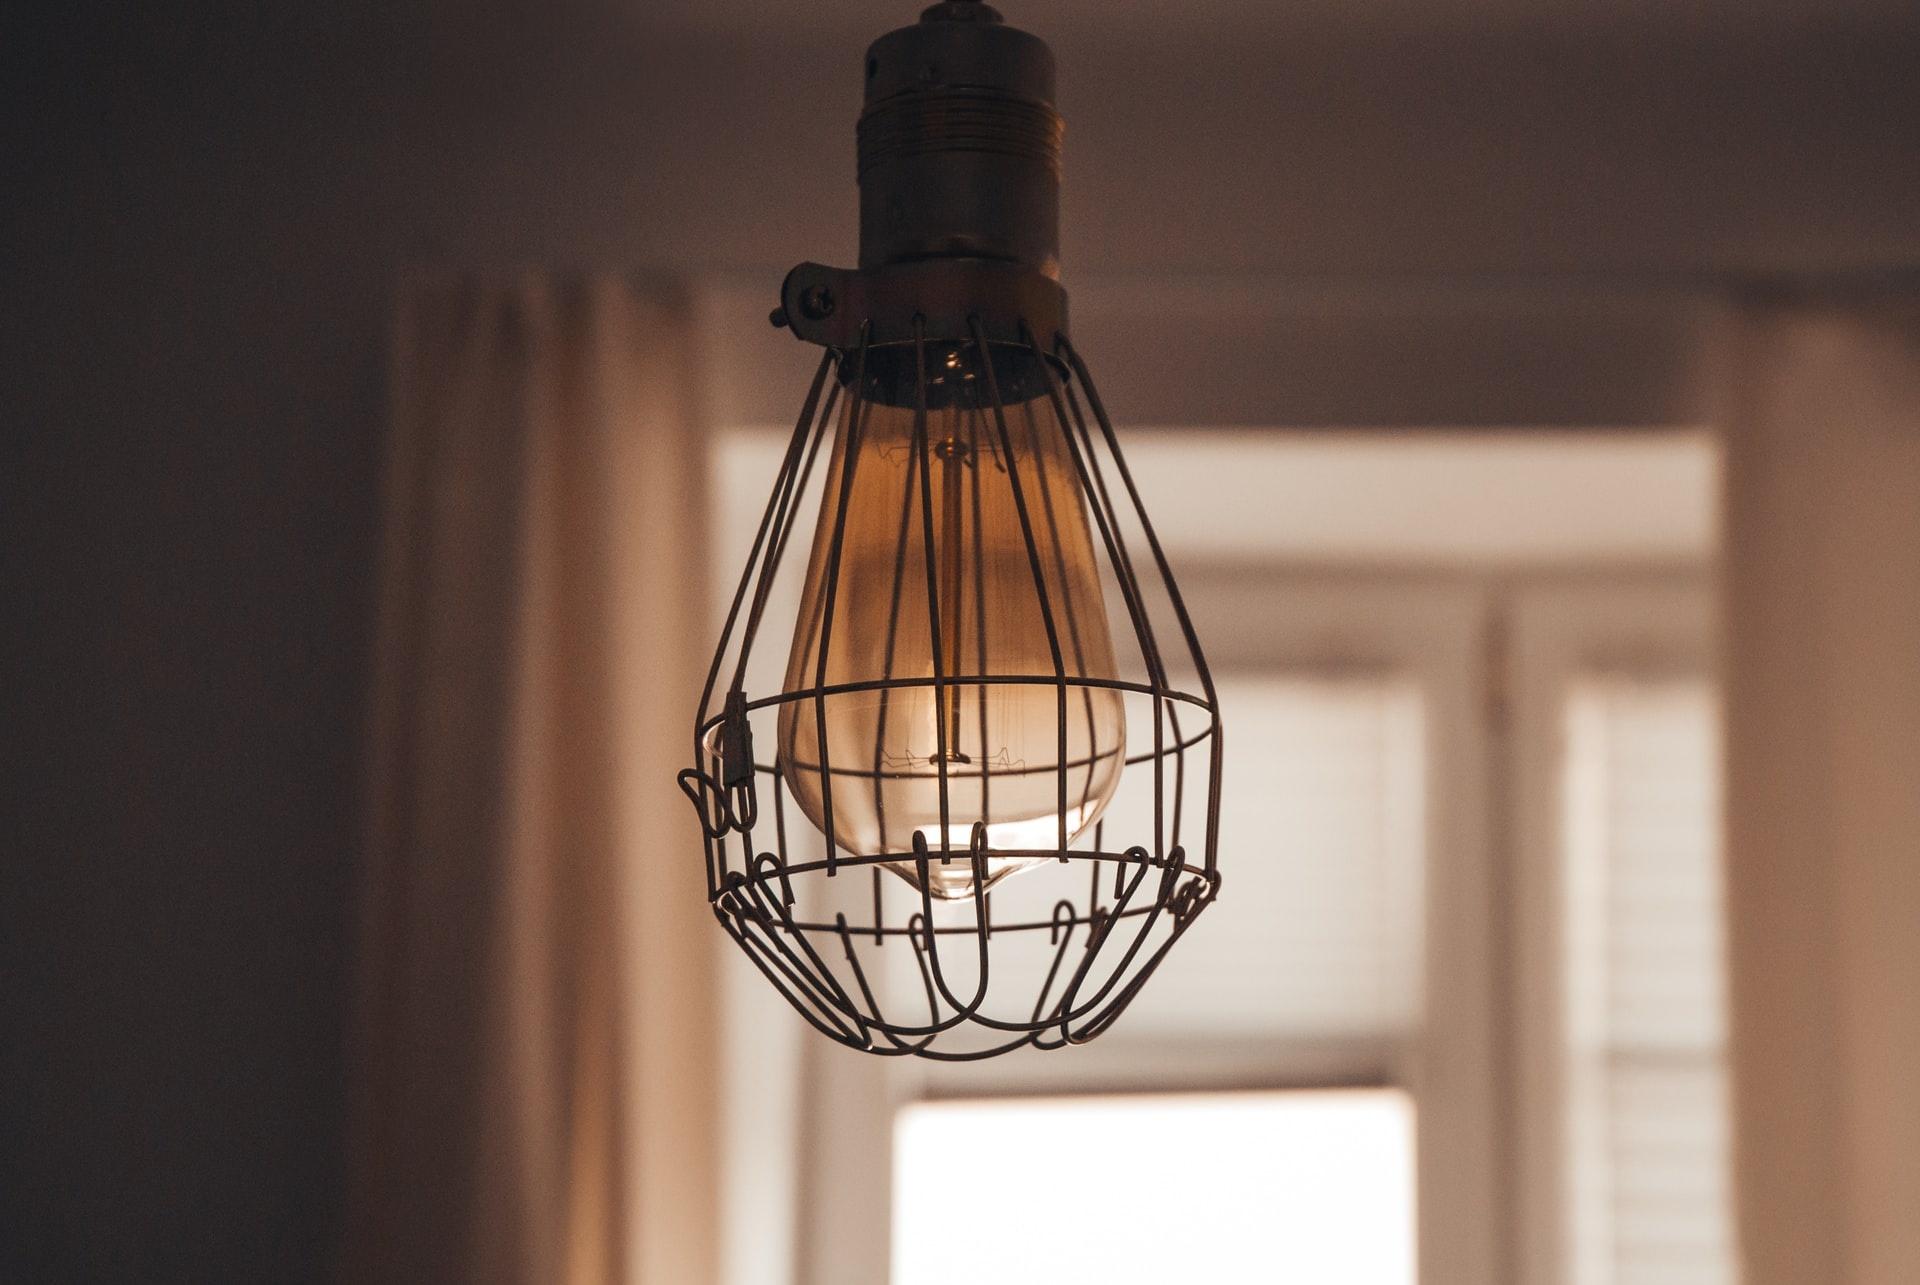 Opnå den rette belysning over middagsbordet